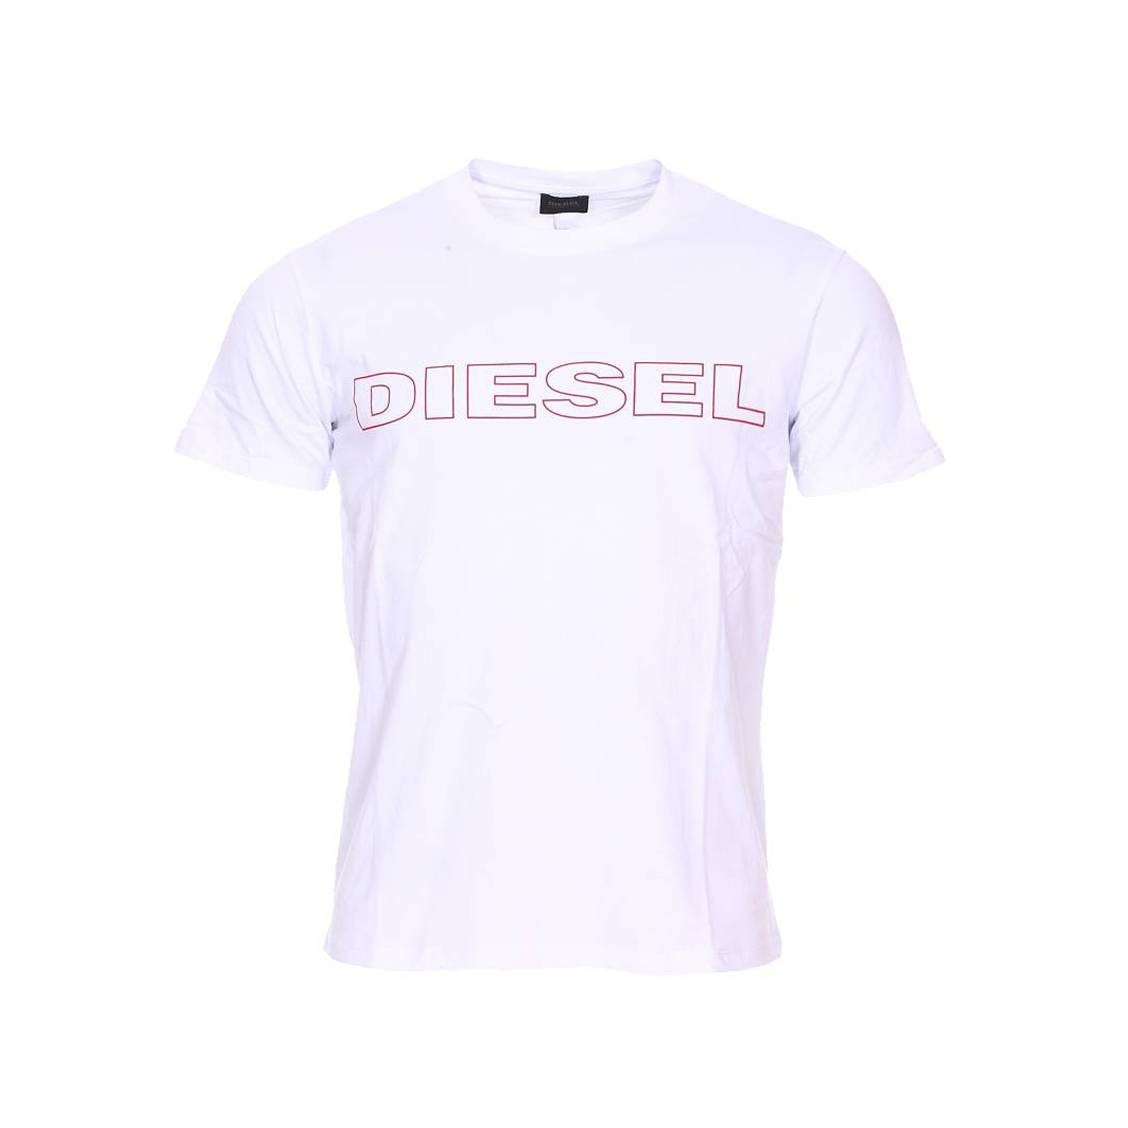 Tee-shirt col rond diesel jake en coton blanc floqué en rouge